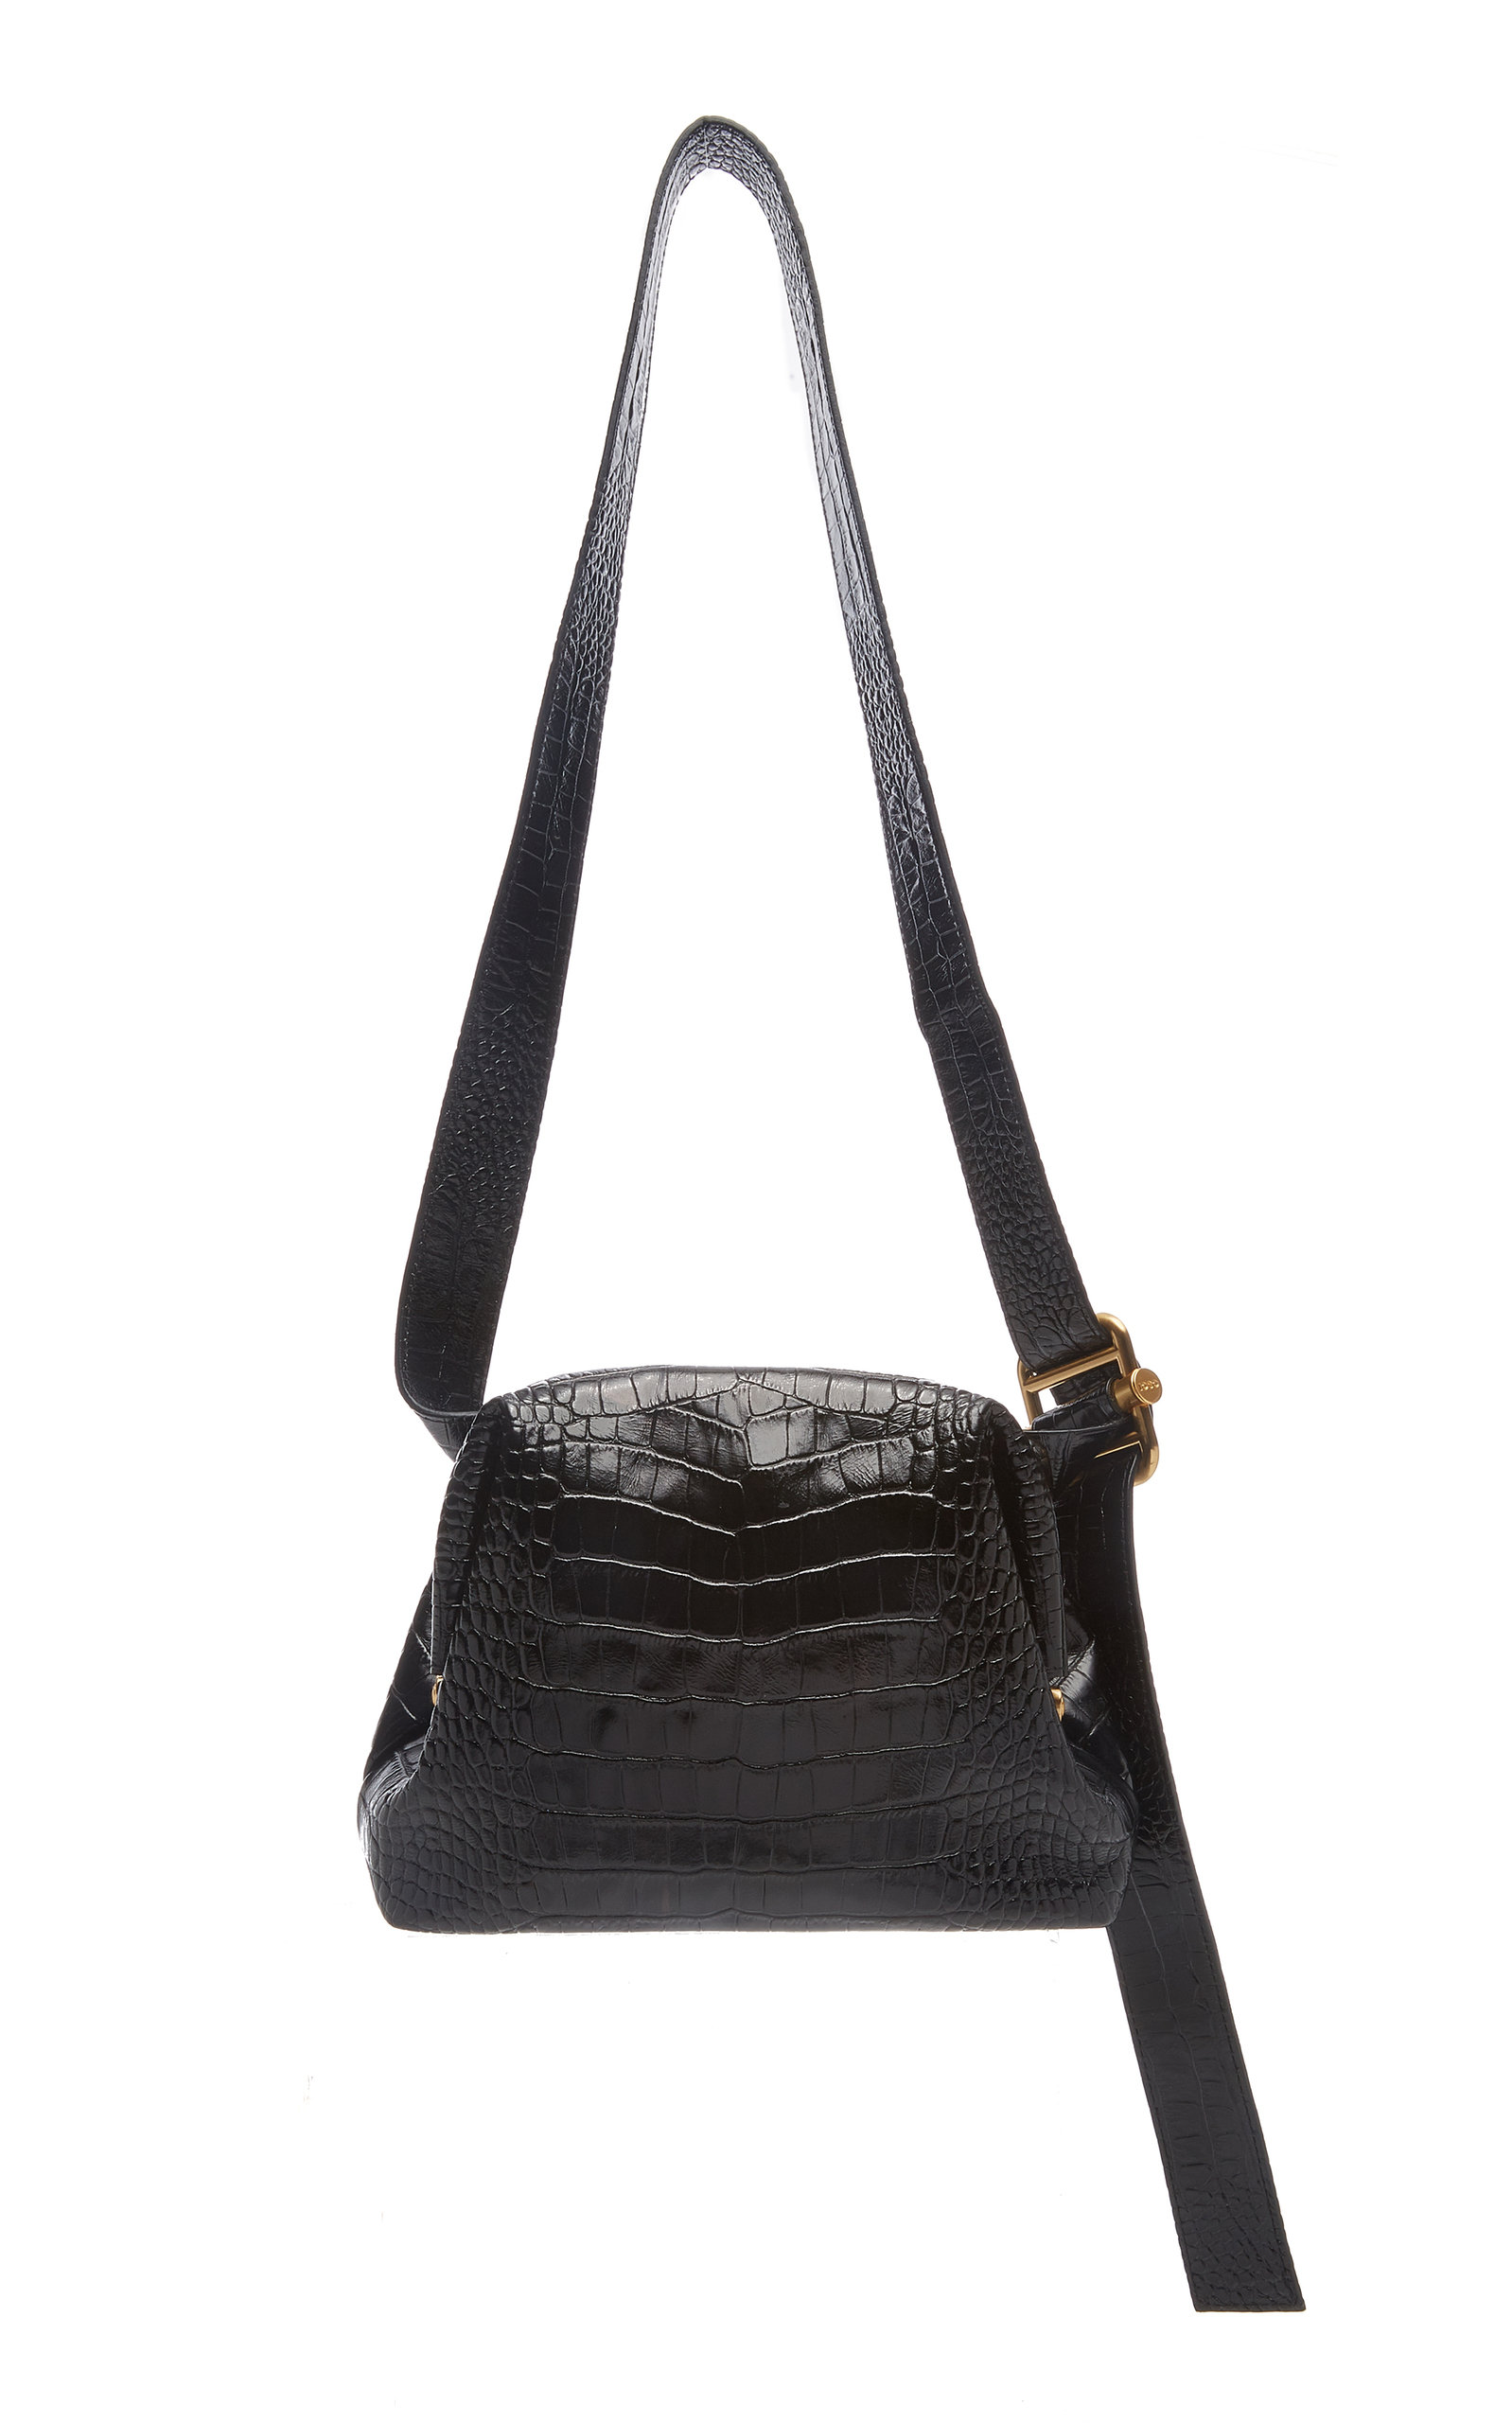 d752433c7ab48 Brot Mini Croc-Effect Leather Bag by OSOI